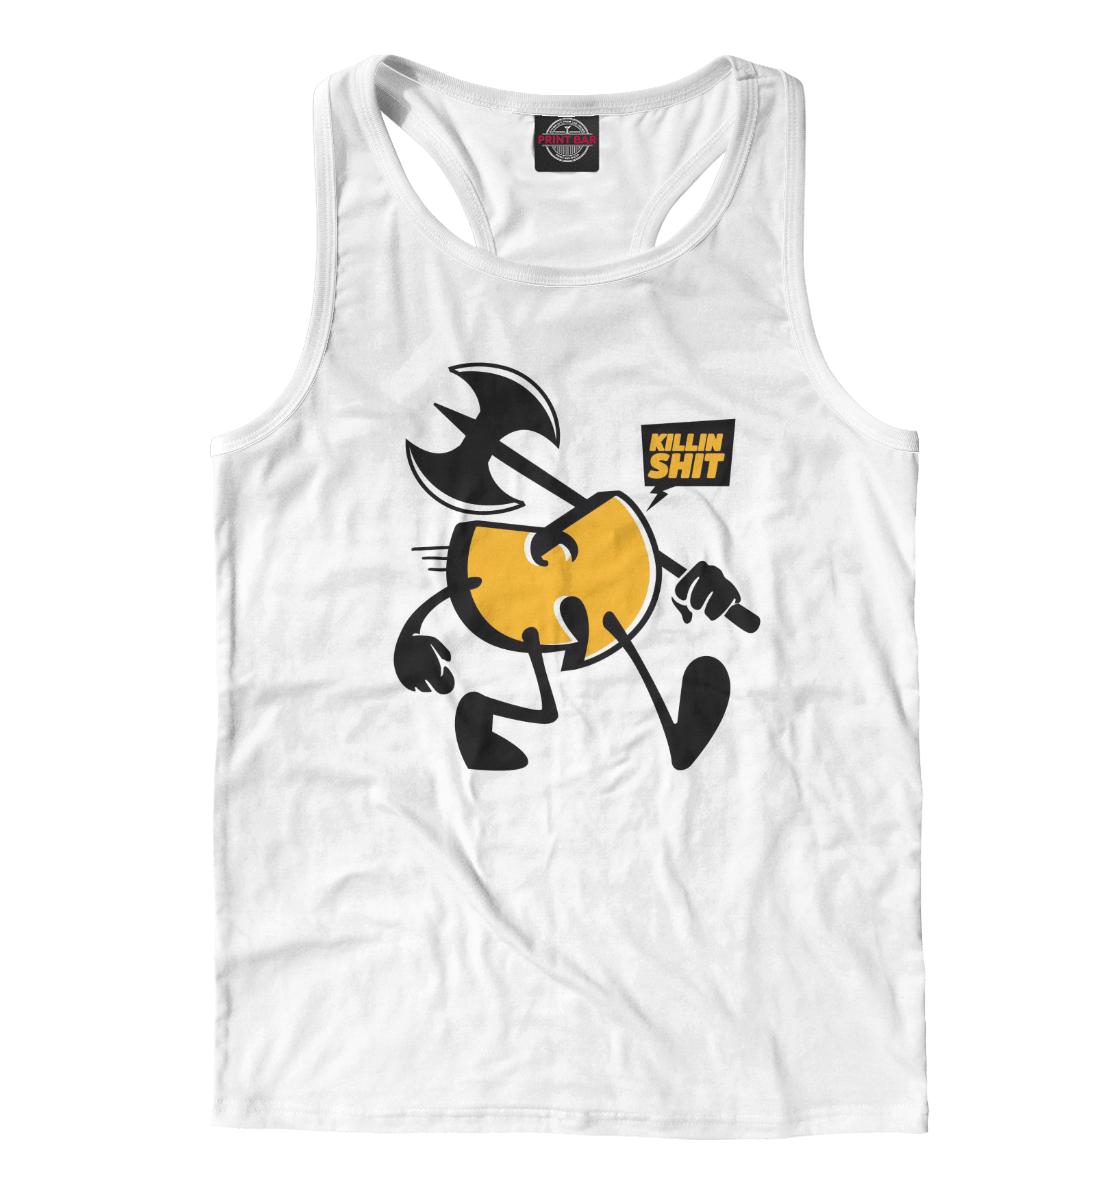 Купить Wu-Tang Clan, Printbar, Майки борцовки, WTK-473778-mayb-2